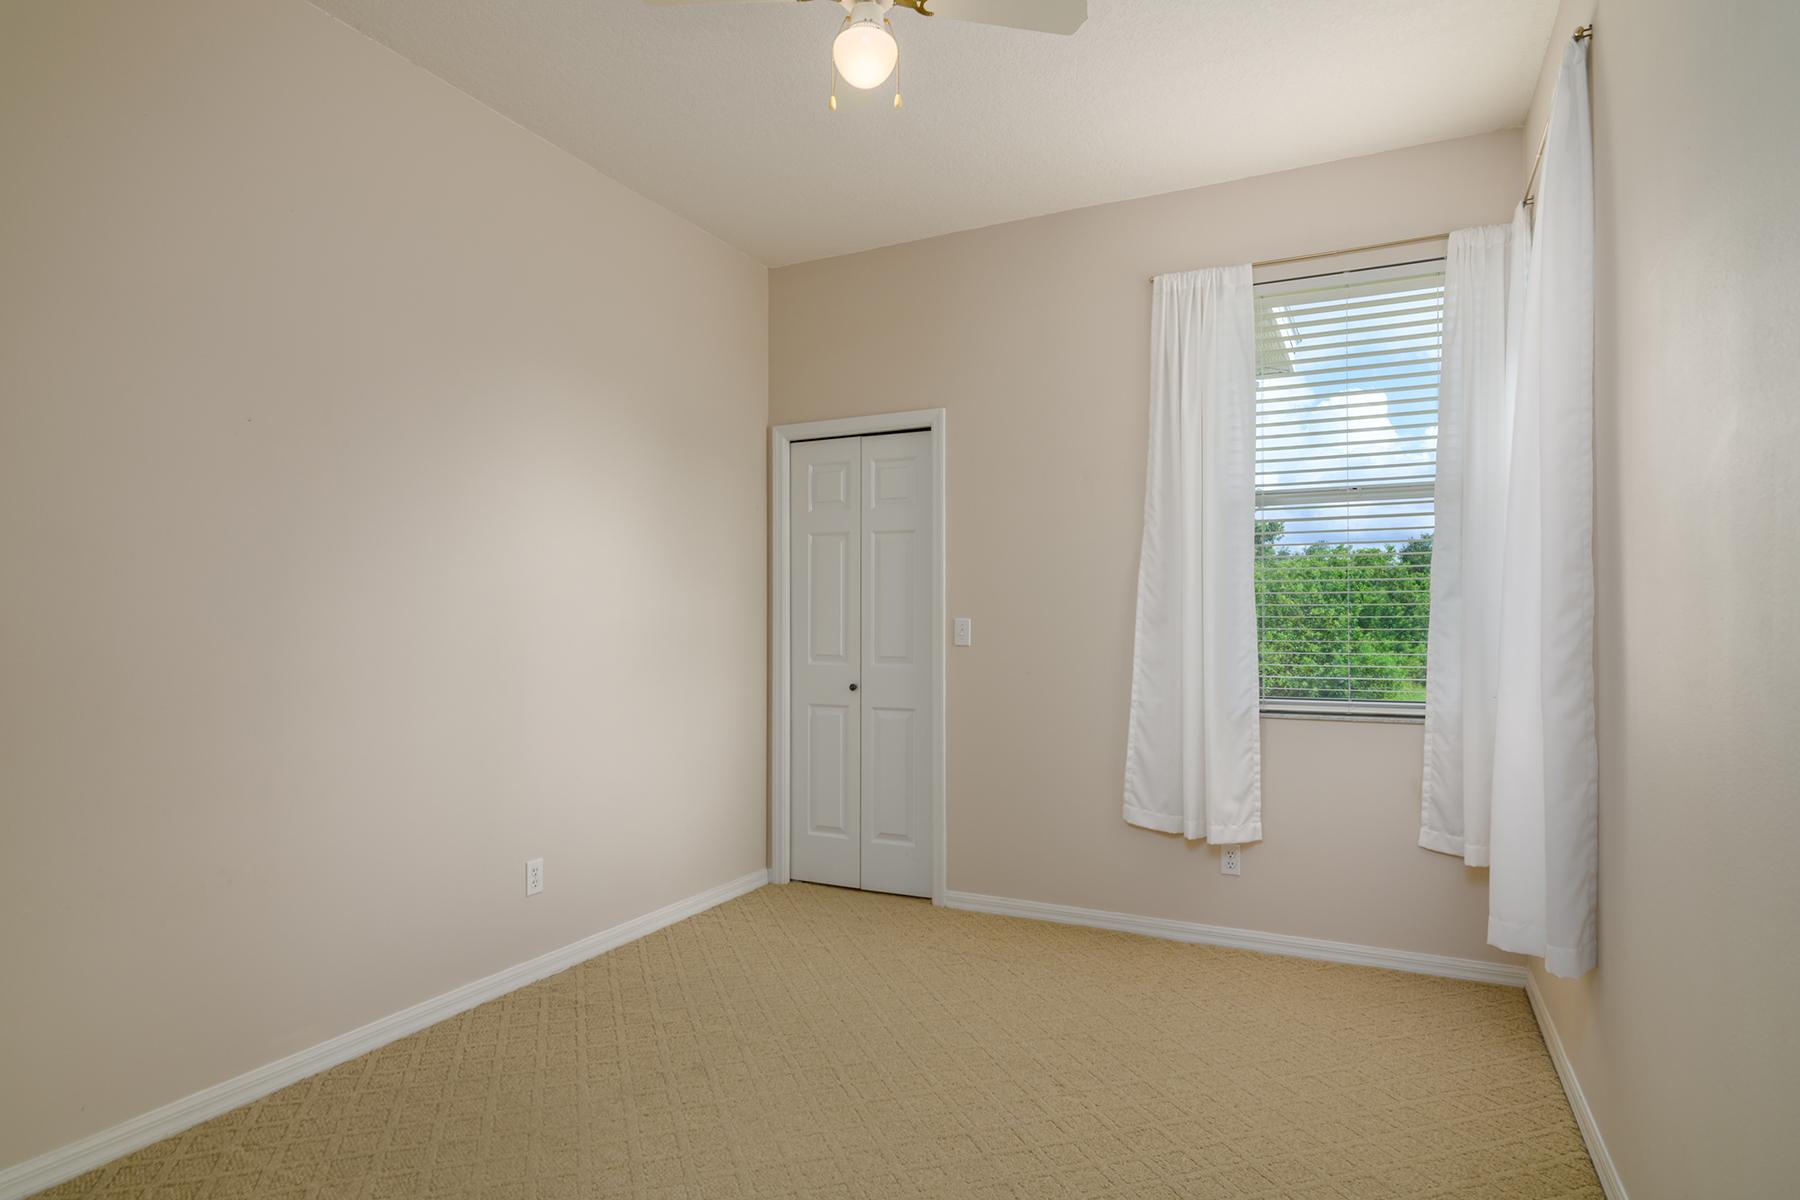 Additional photo for property listing at MAGNOLIA HILL 28801 100th Dr E, Myakka City, Florida 34251 Estados Unidos